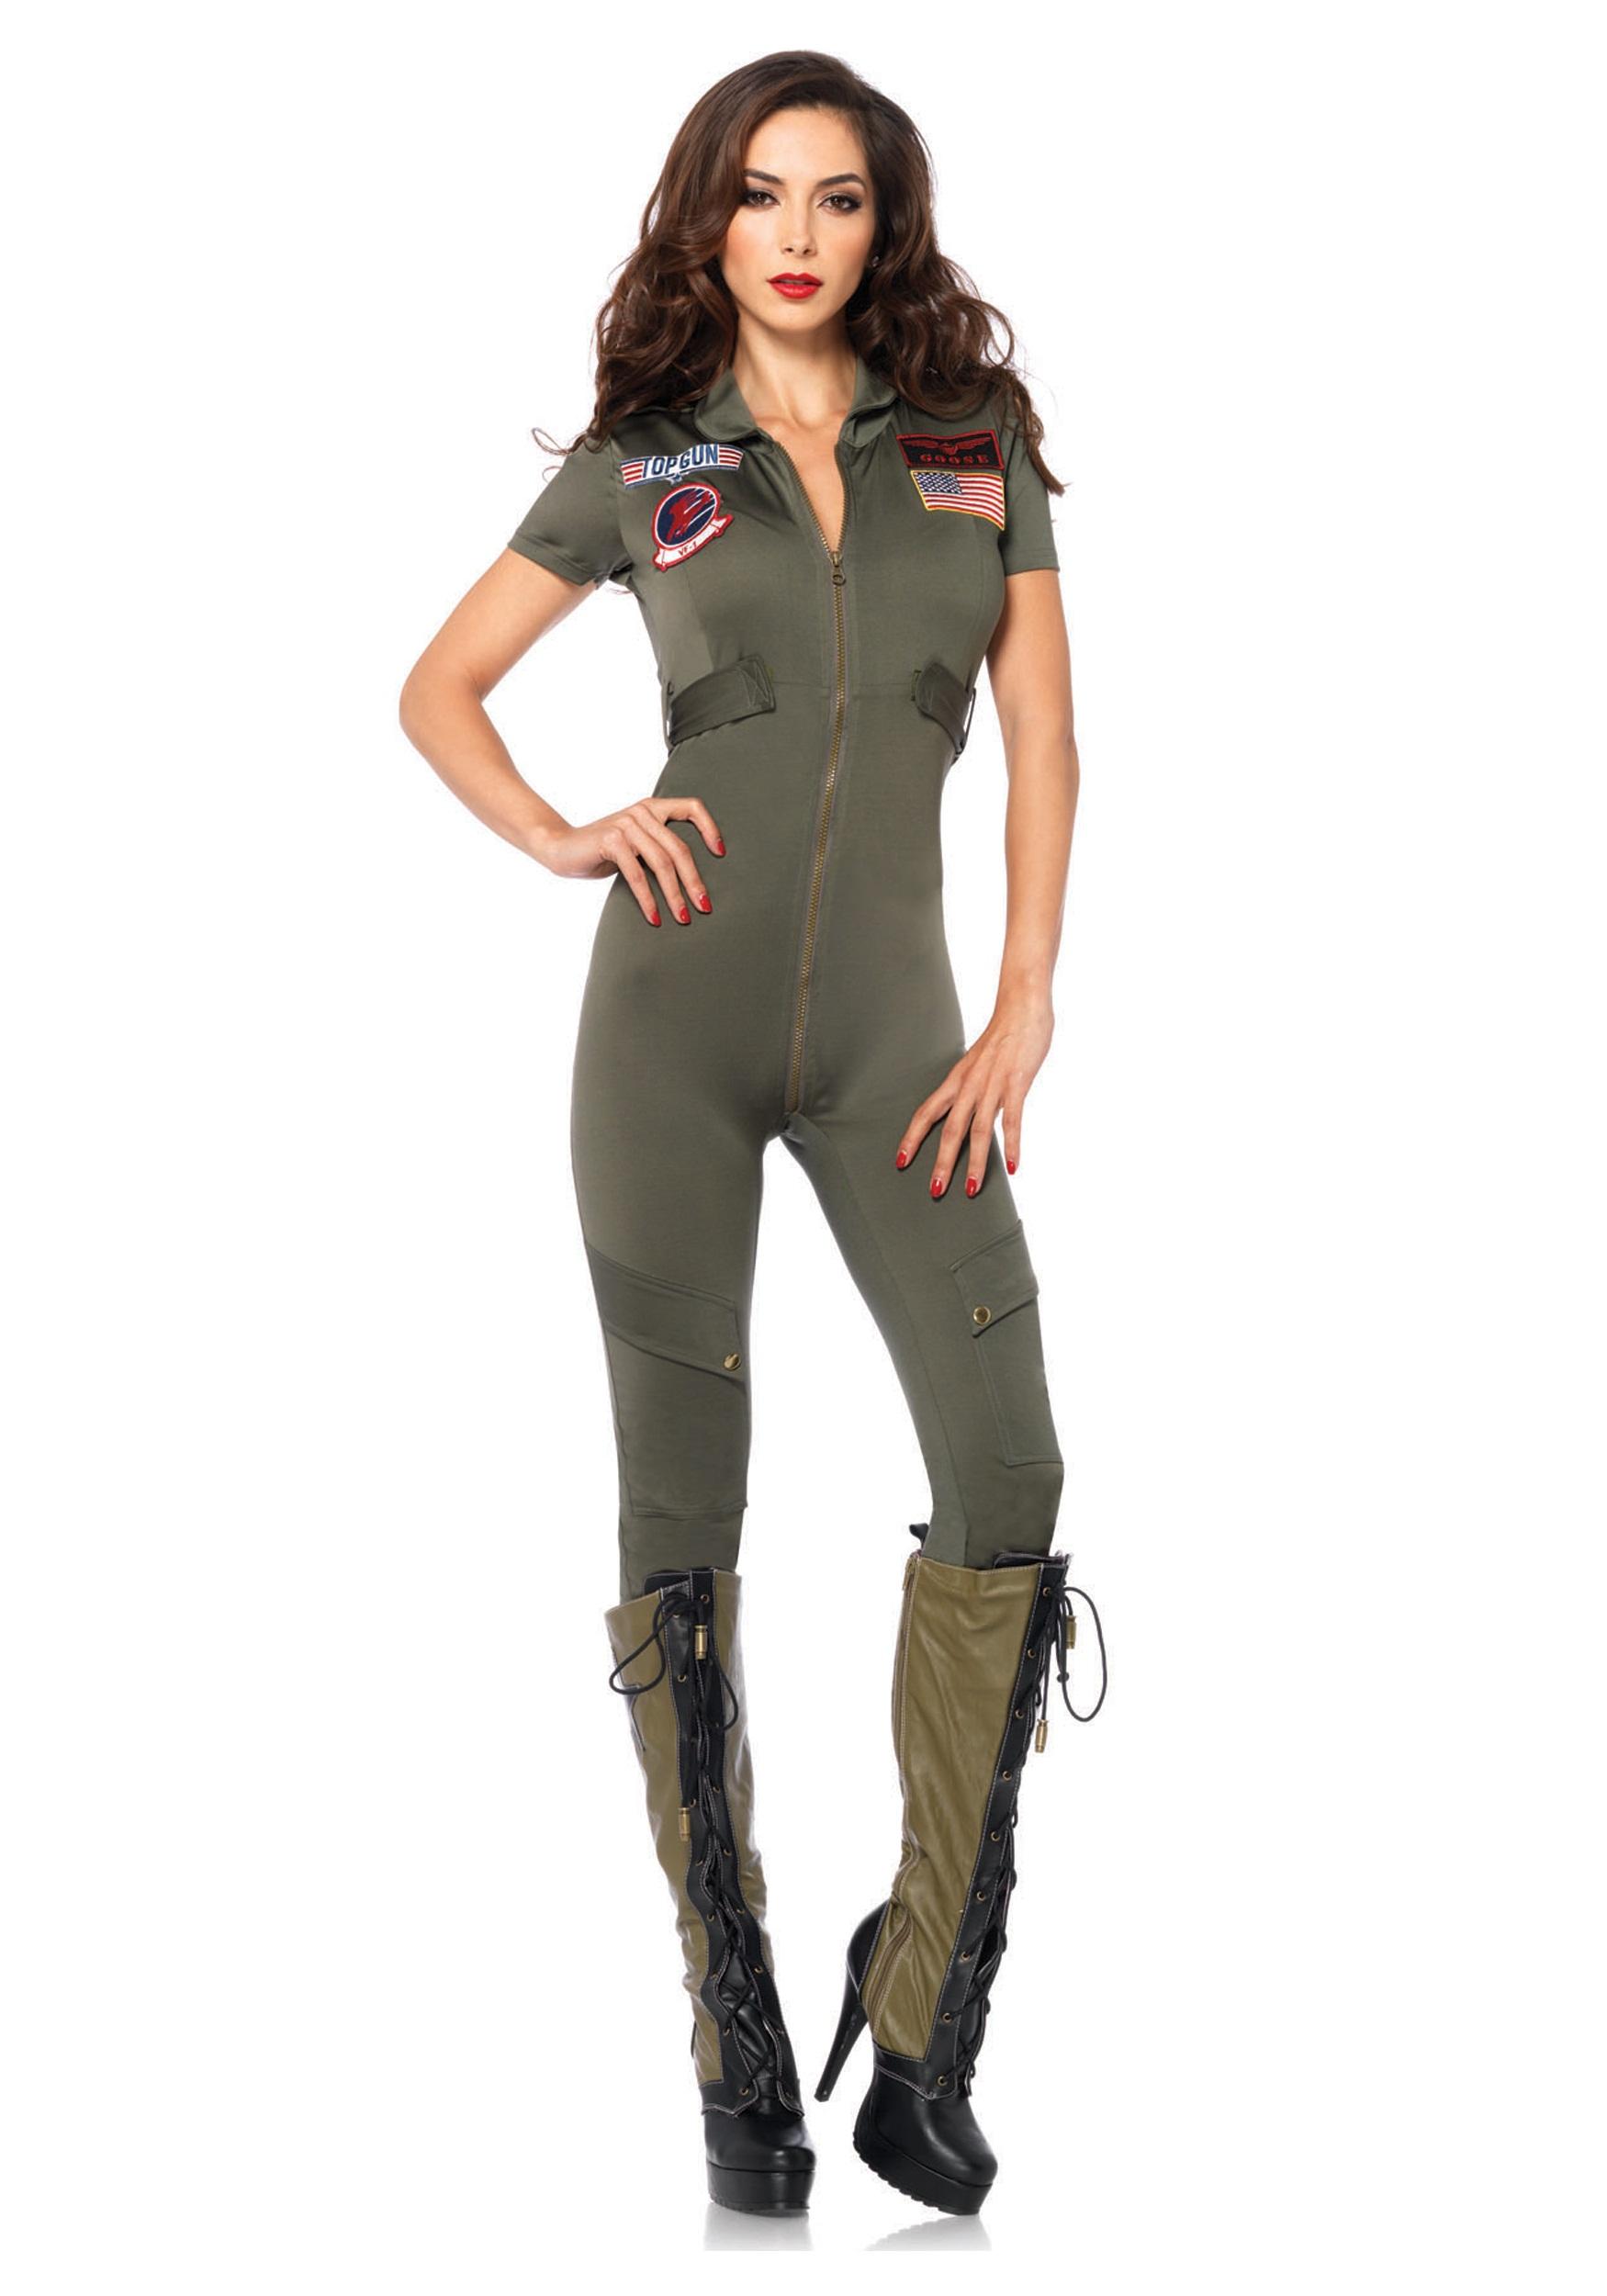 Top Gun Jumpsuit Costume for Women